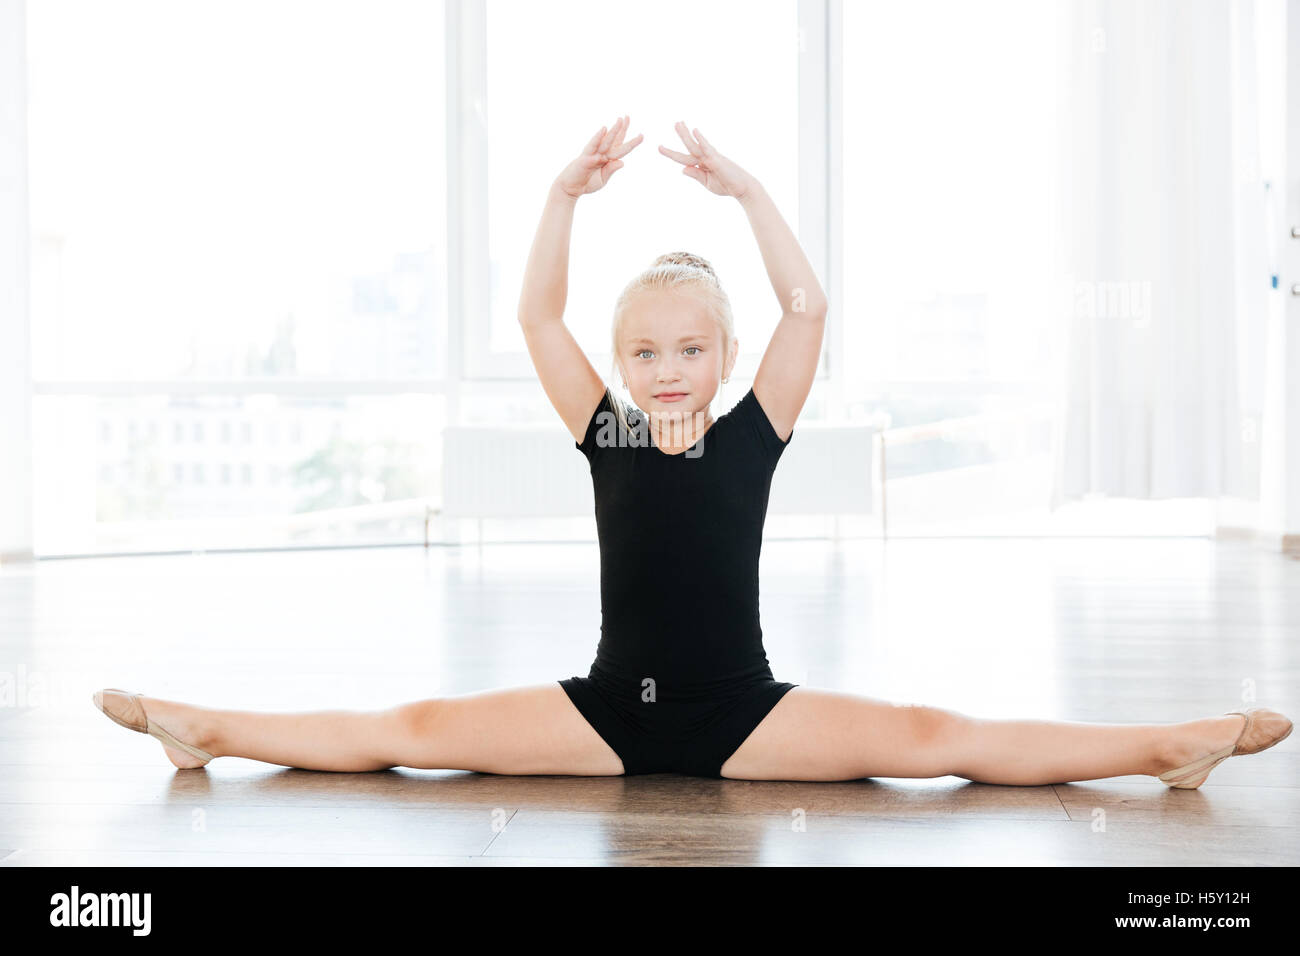 61cd5001fea5 Cute little girl ballerina doing twine on the floor in ballet school ...